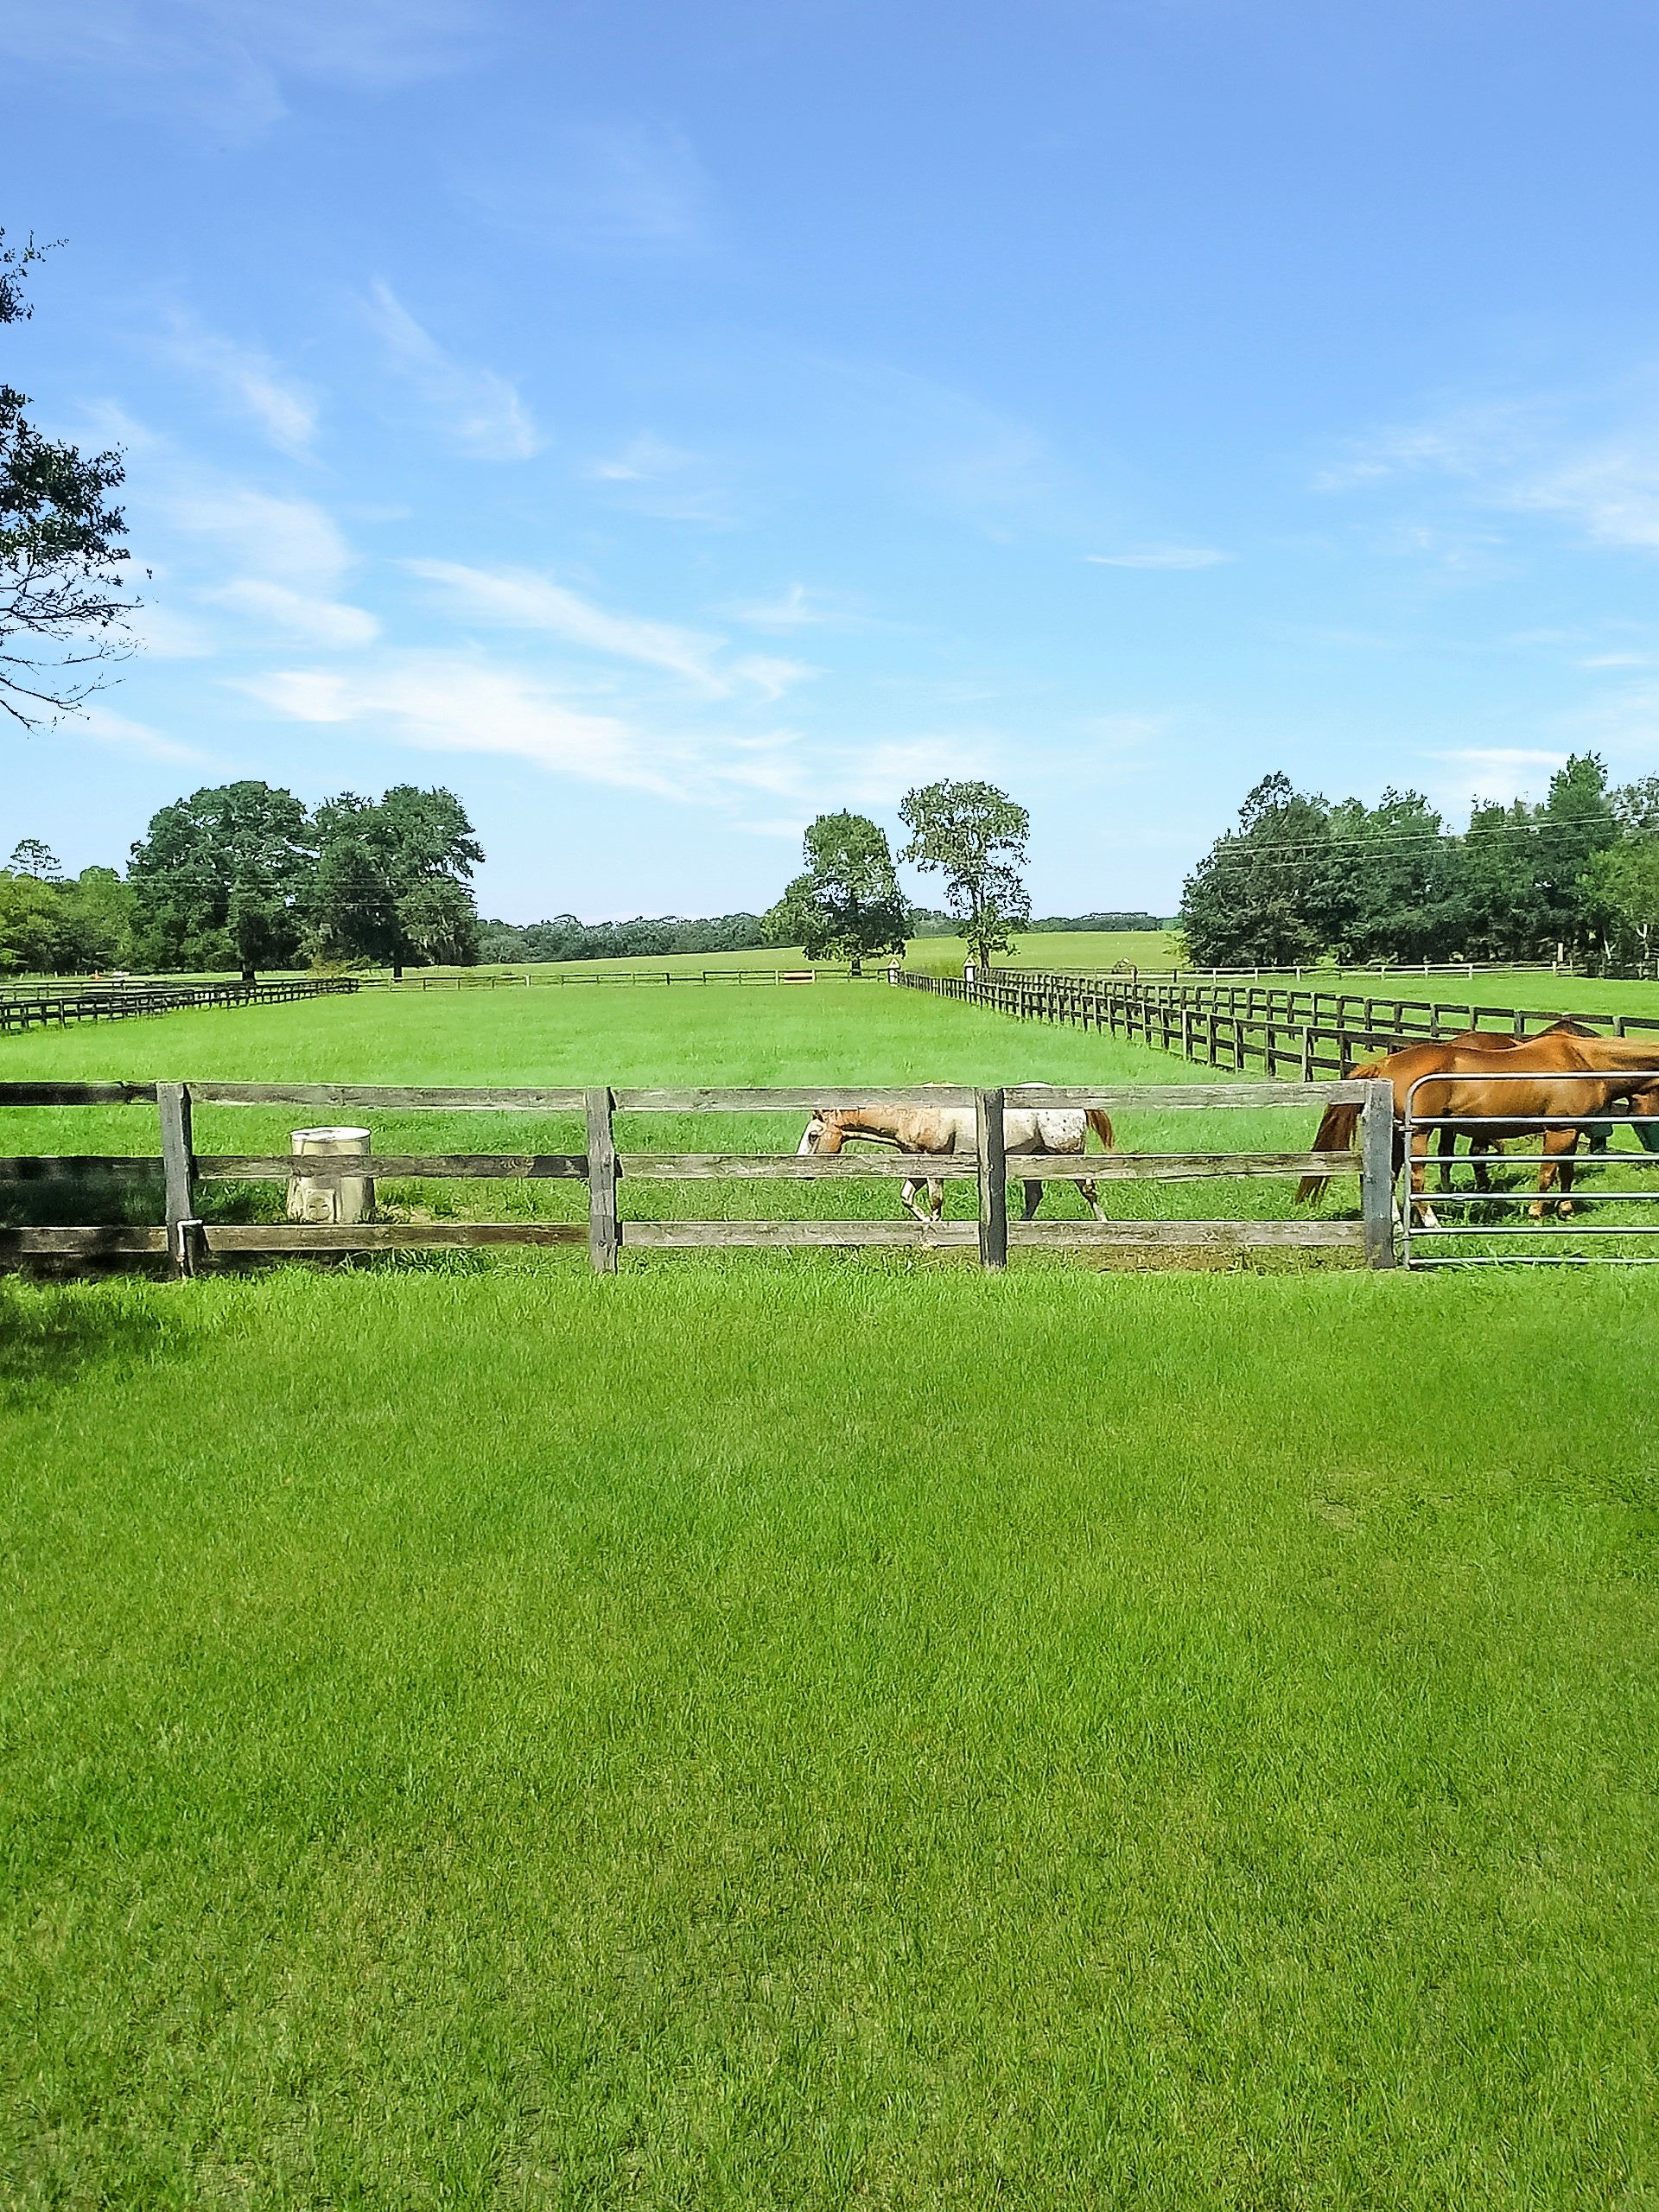 Always A Breeze Farm 9 Acre Farm In Dunnellon Fl Golf